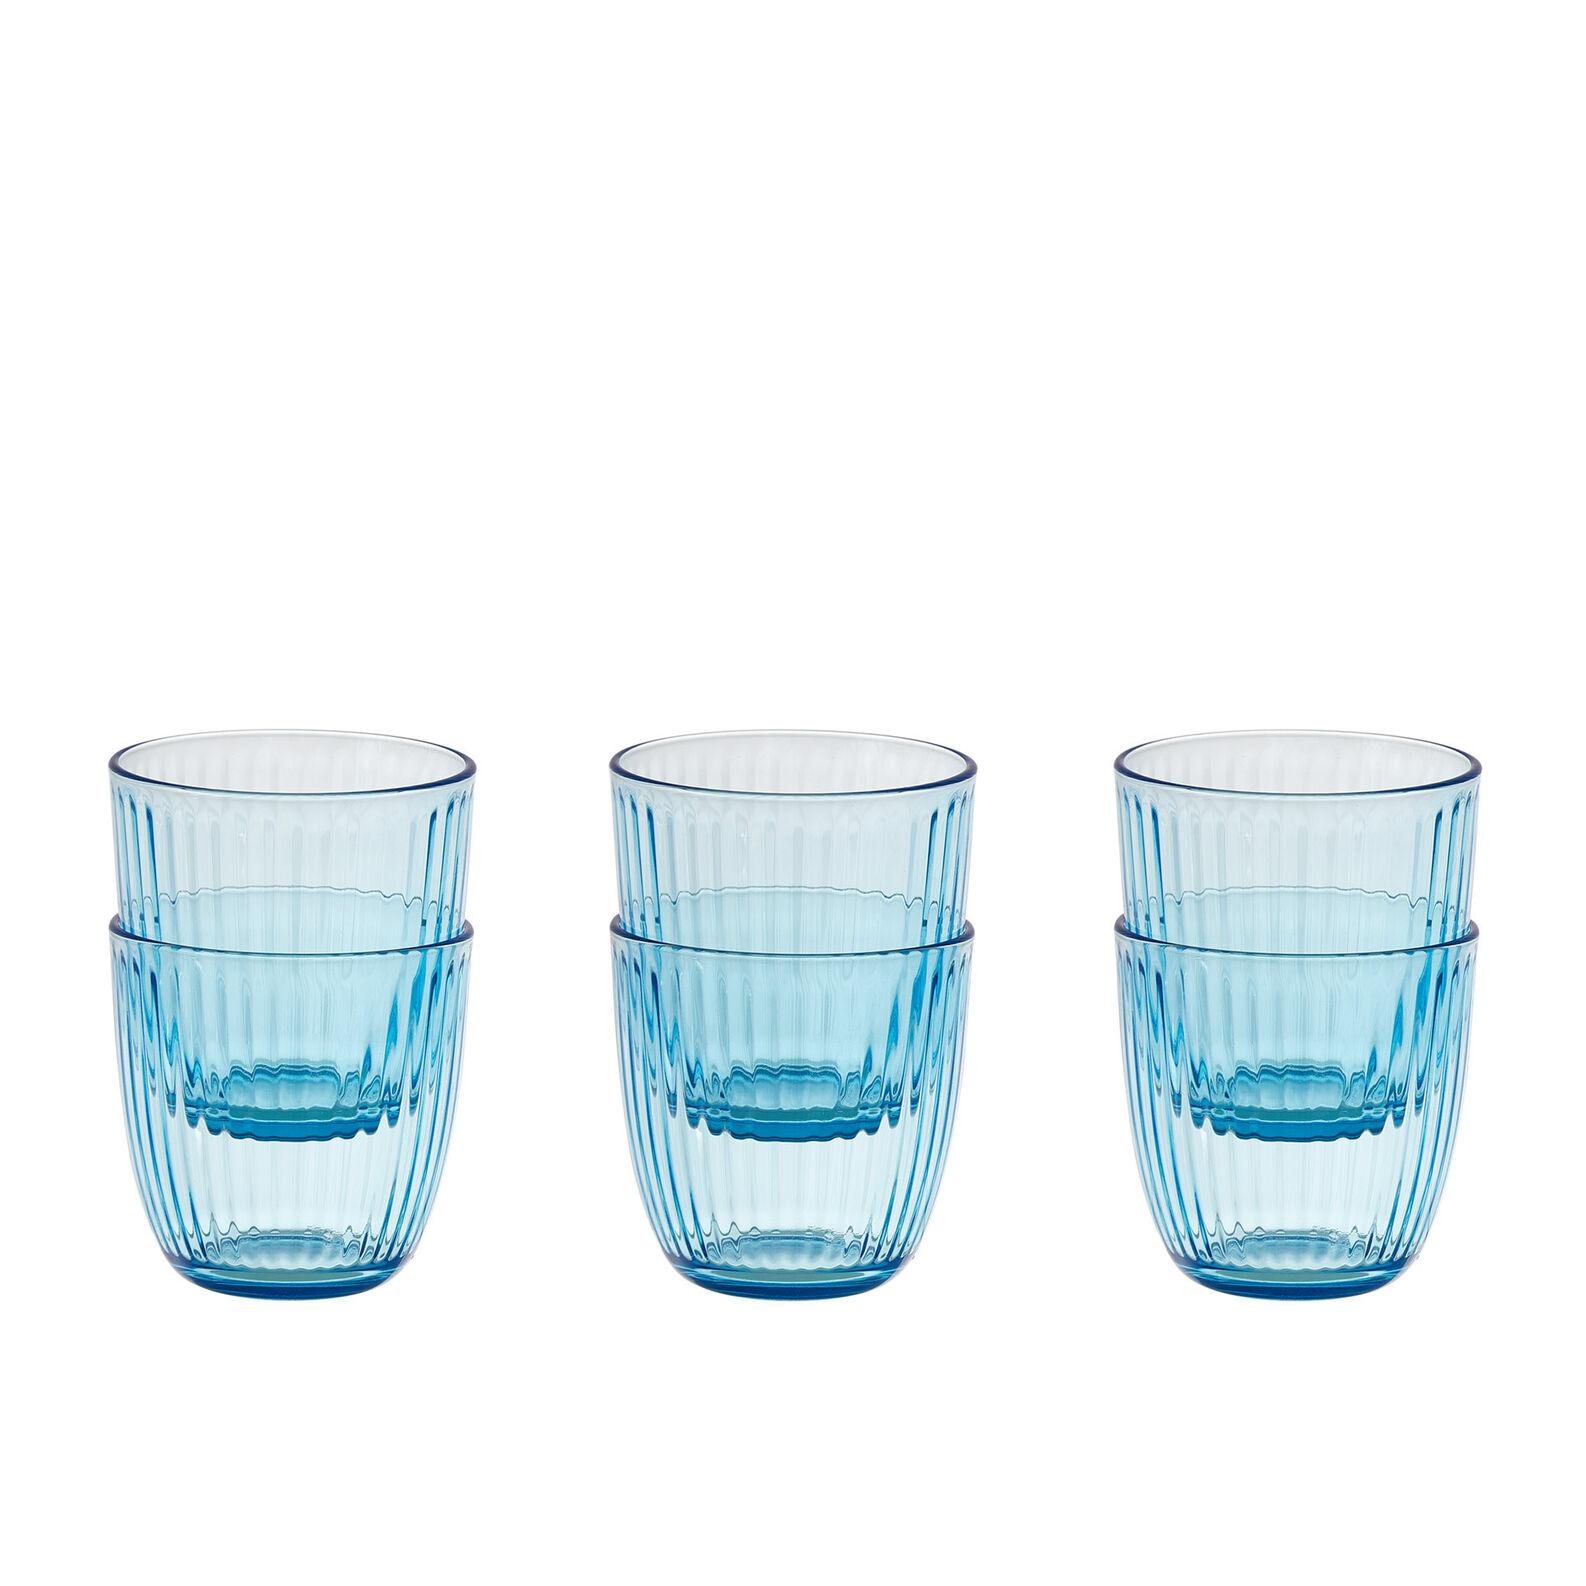 Set of 6 coloured glass tumblers